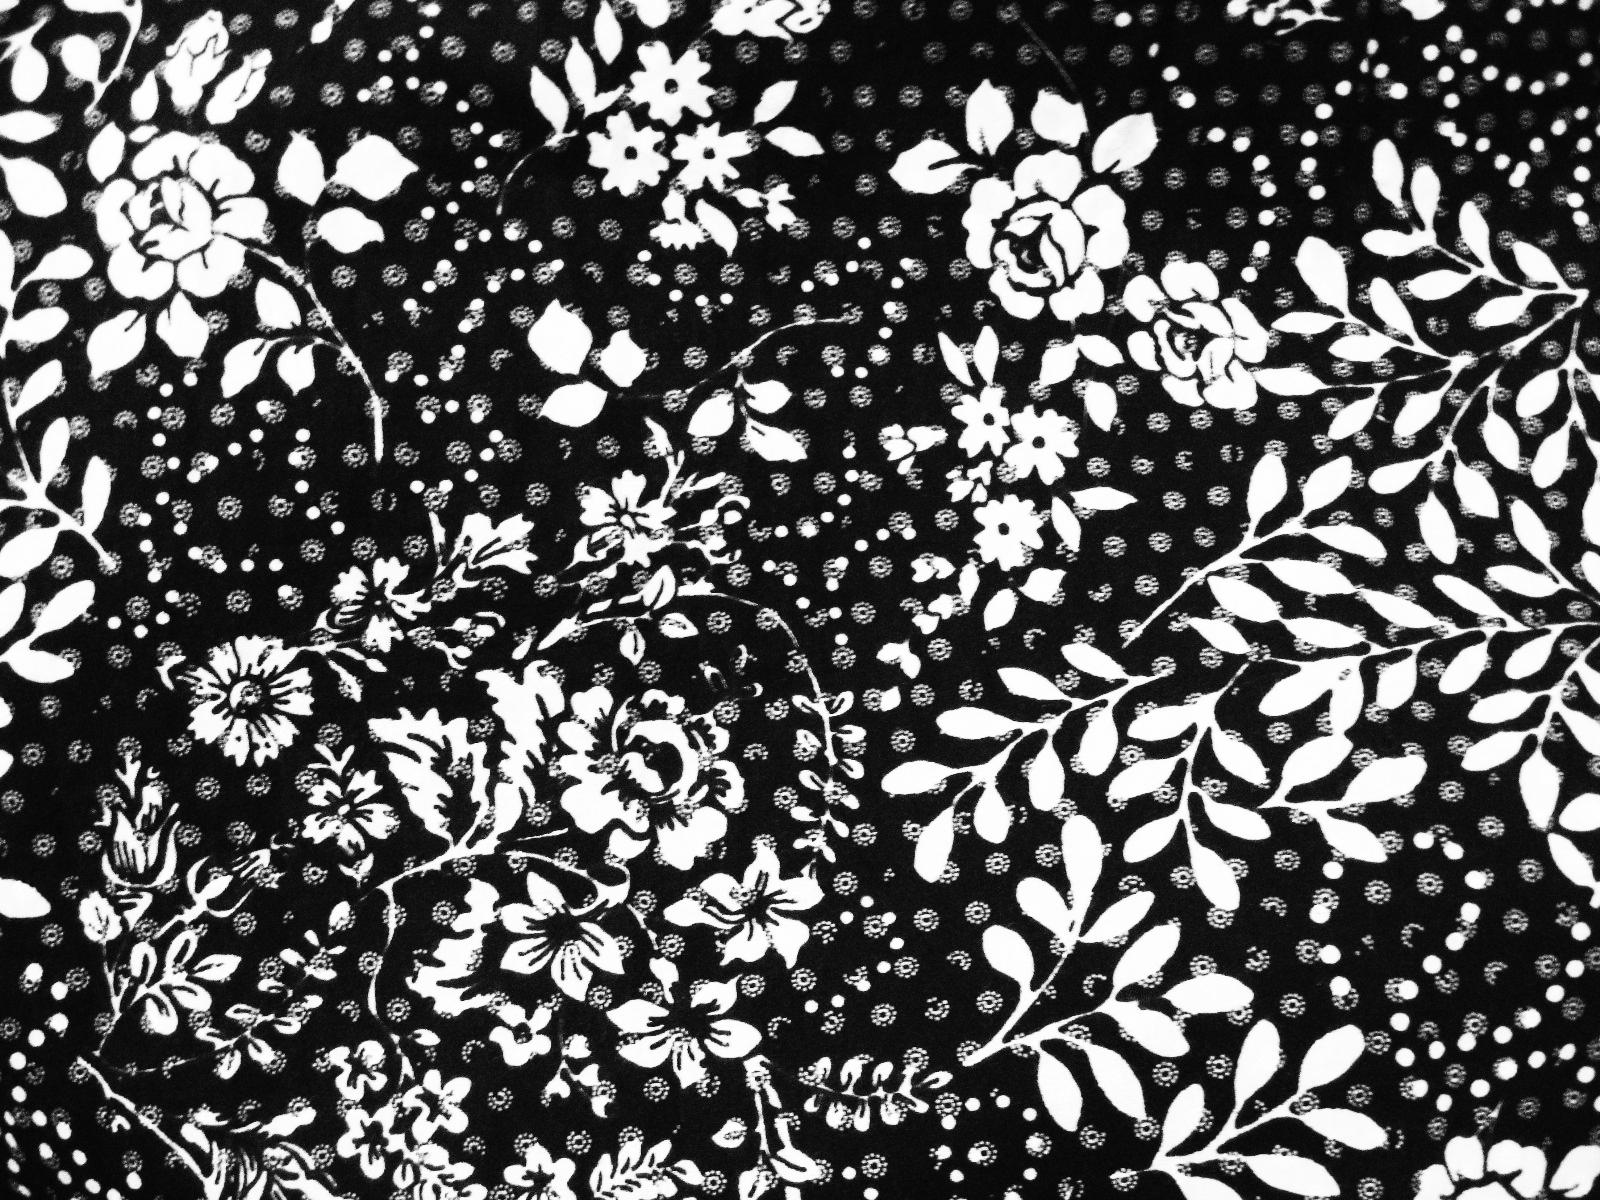 FMP: Textures & Patterns